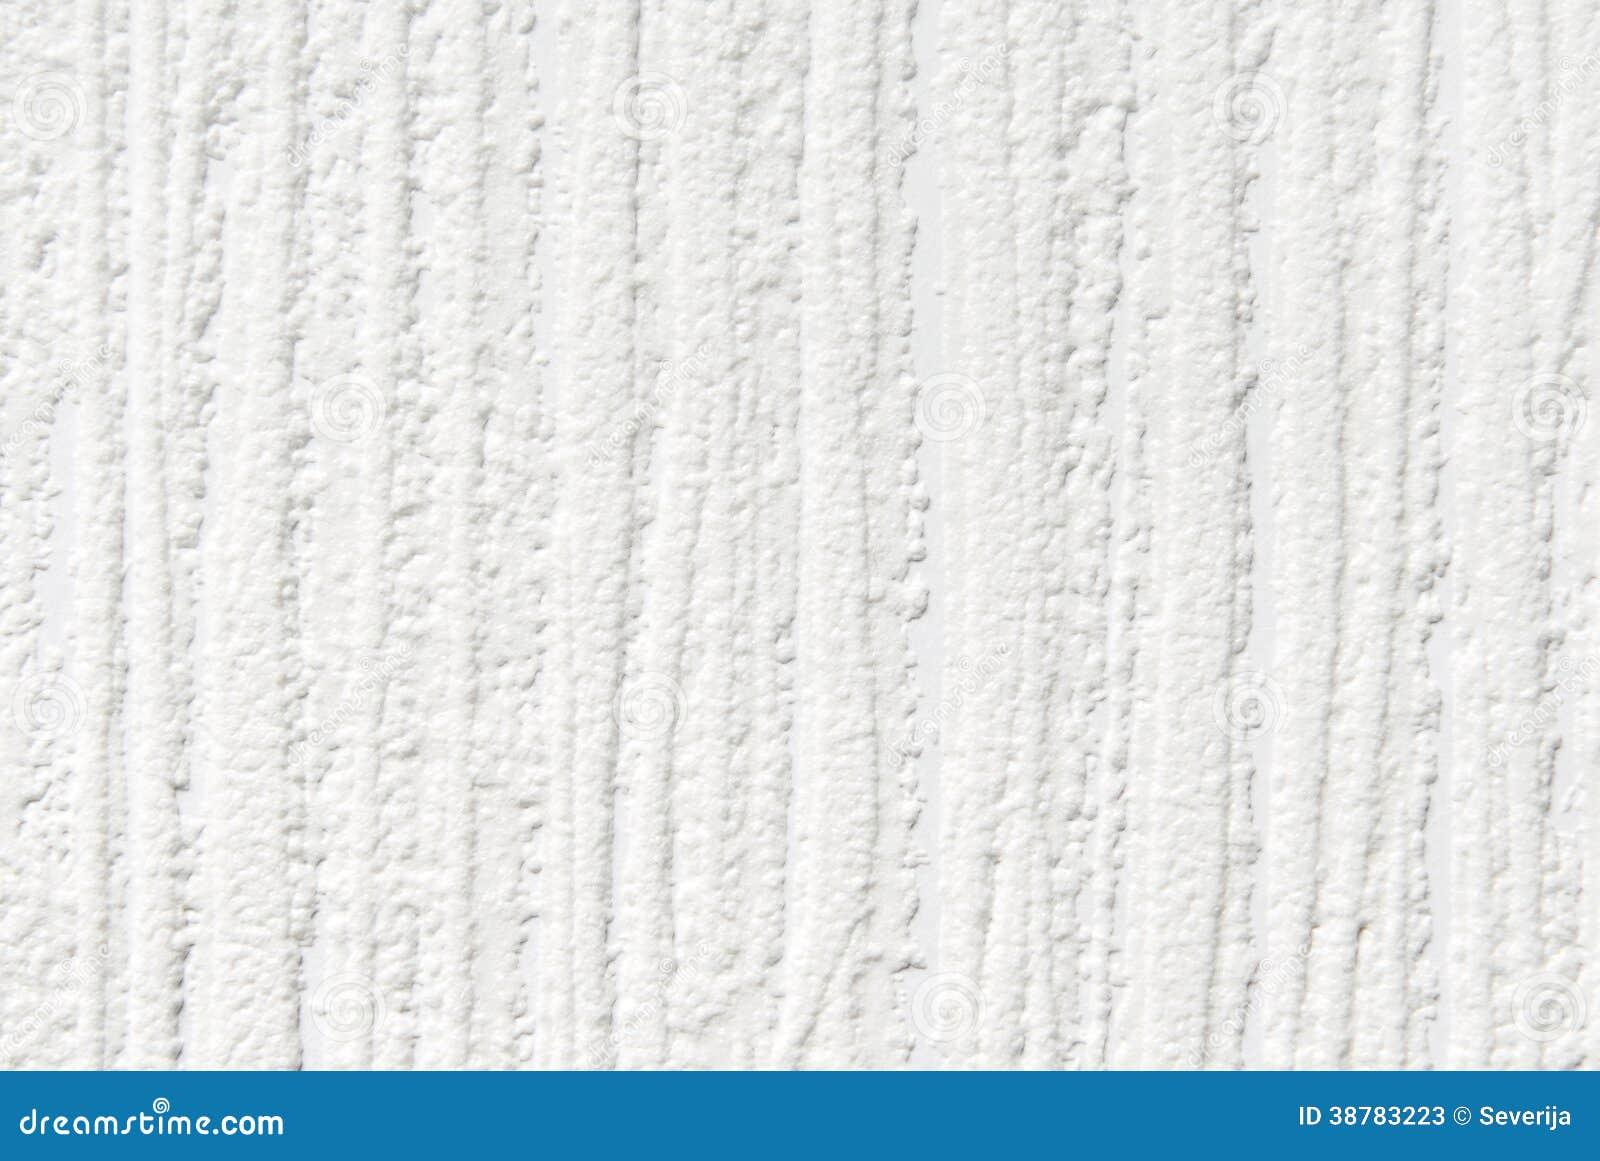 Fondo texturizado papel pintado blanco foto de archivo for Papel pintado grueso